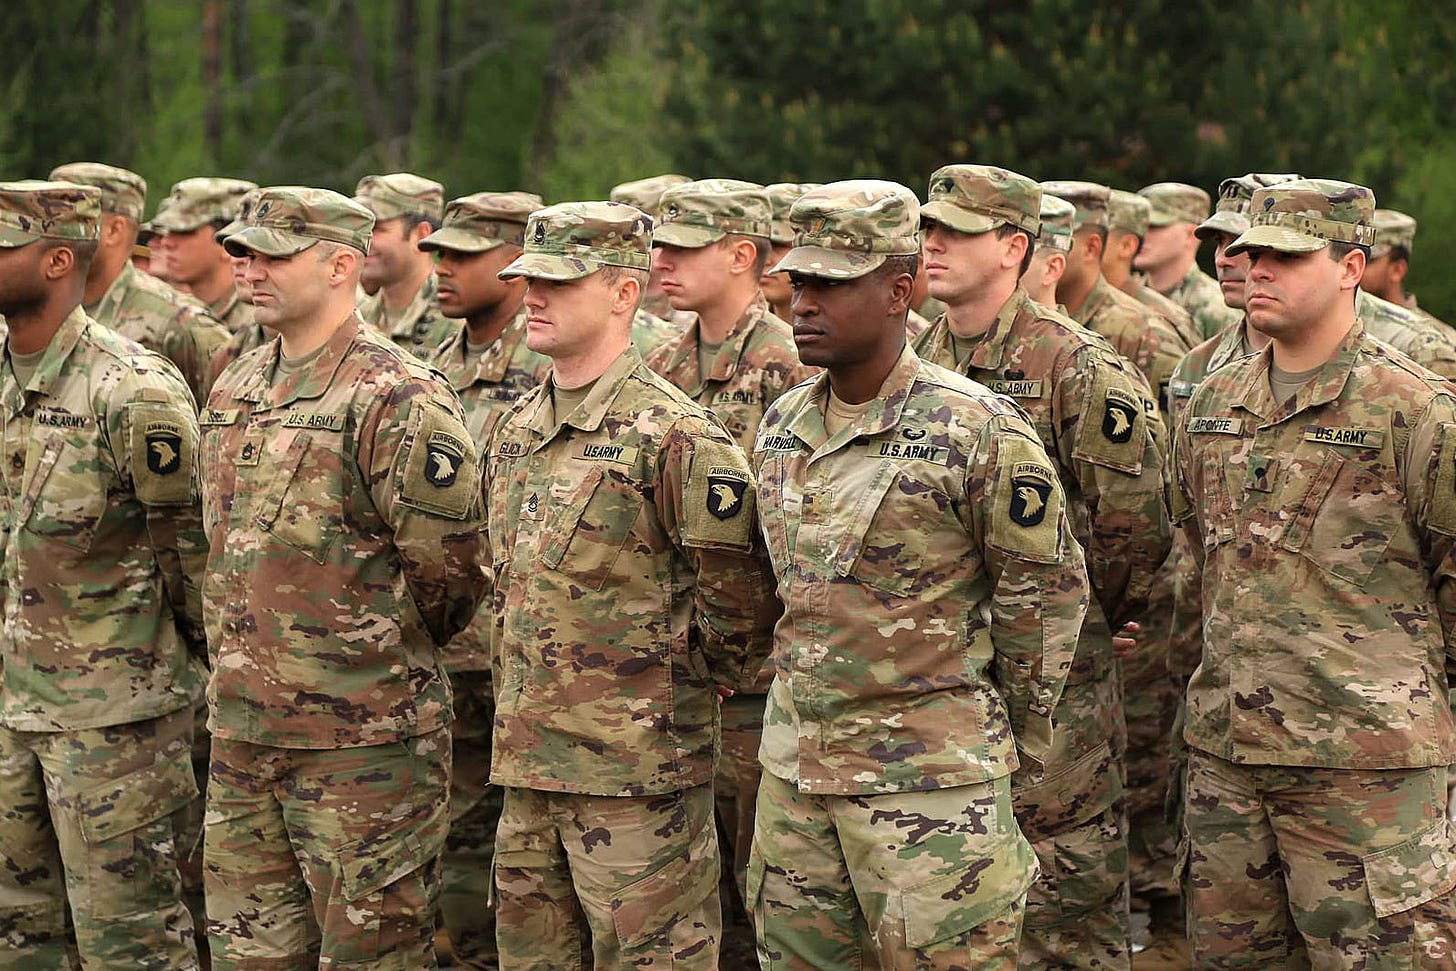 US Army 101st Airborne soldiers deploy to Ukraine   KyivPost - Ukraine's  Global Voice